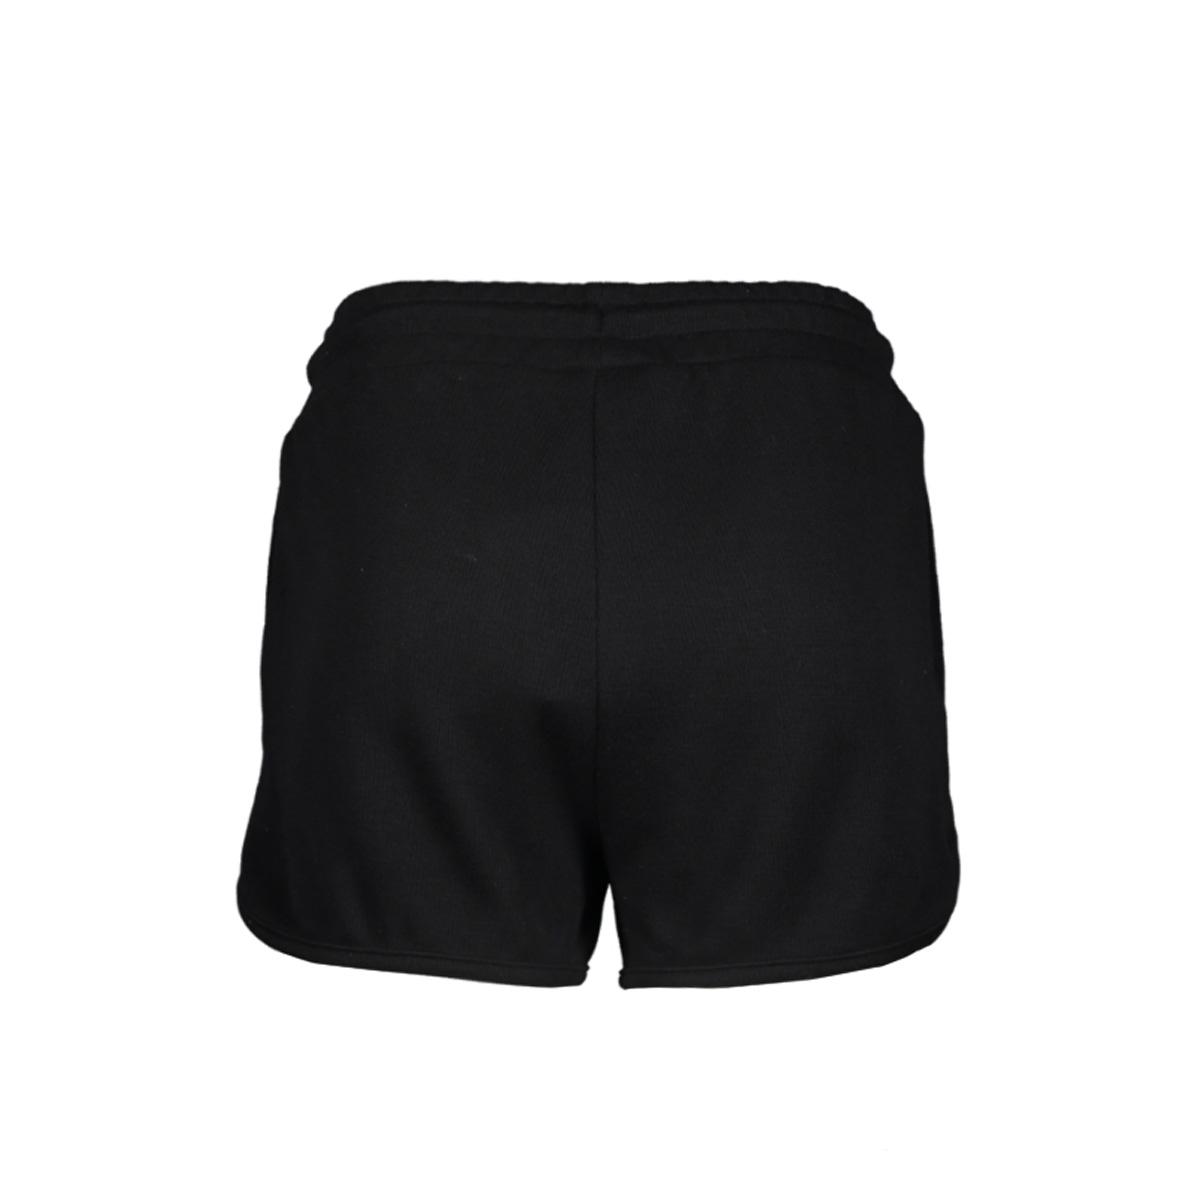 onpjenna sweat shorts 15175630 only play sport short black